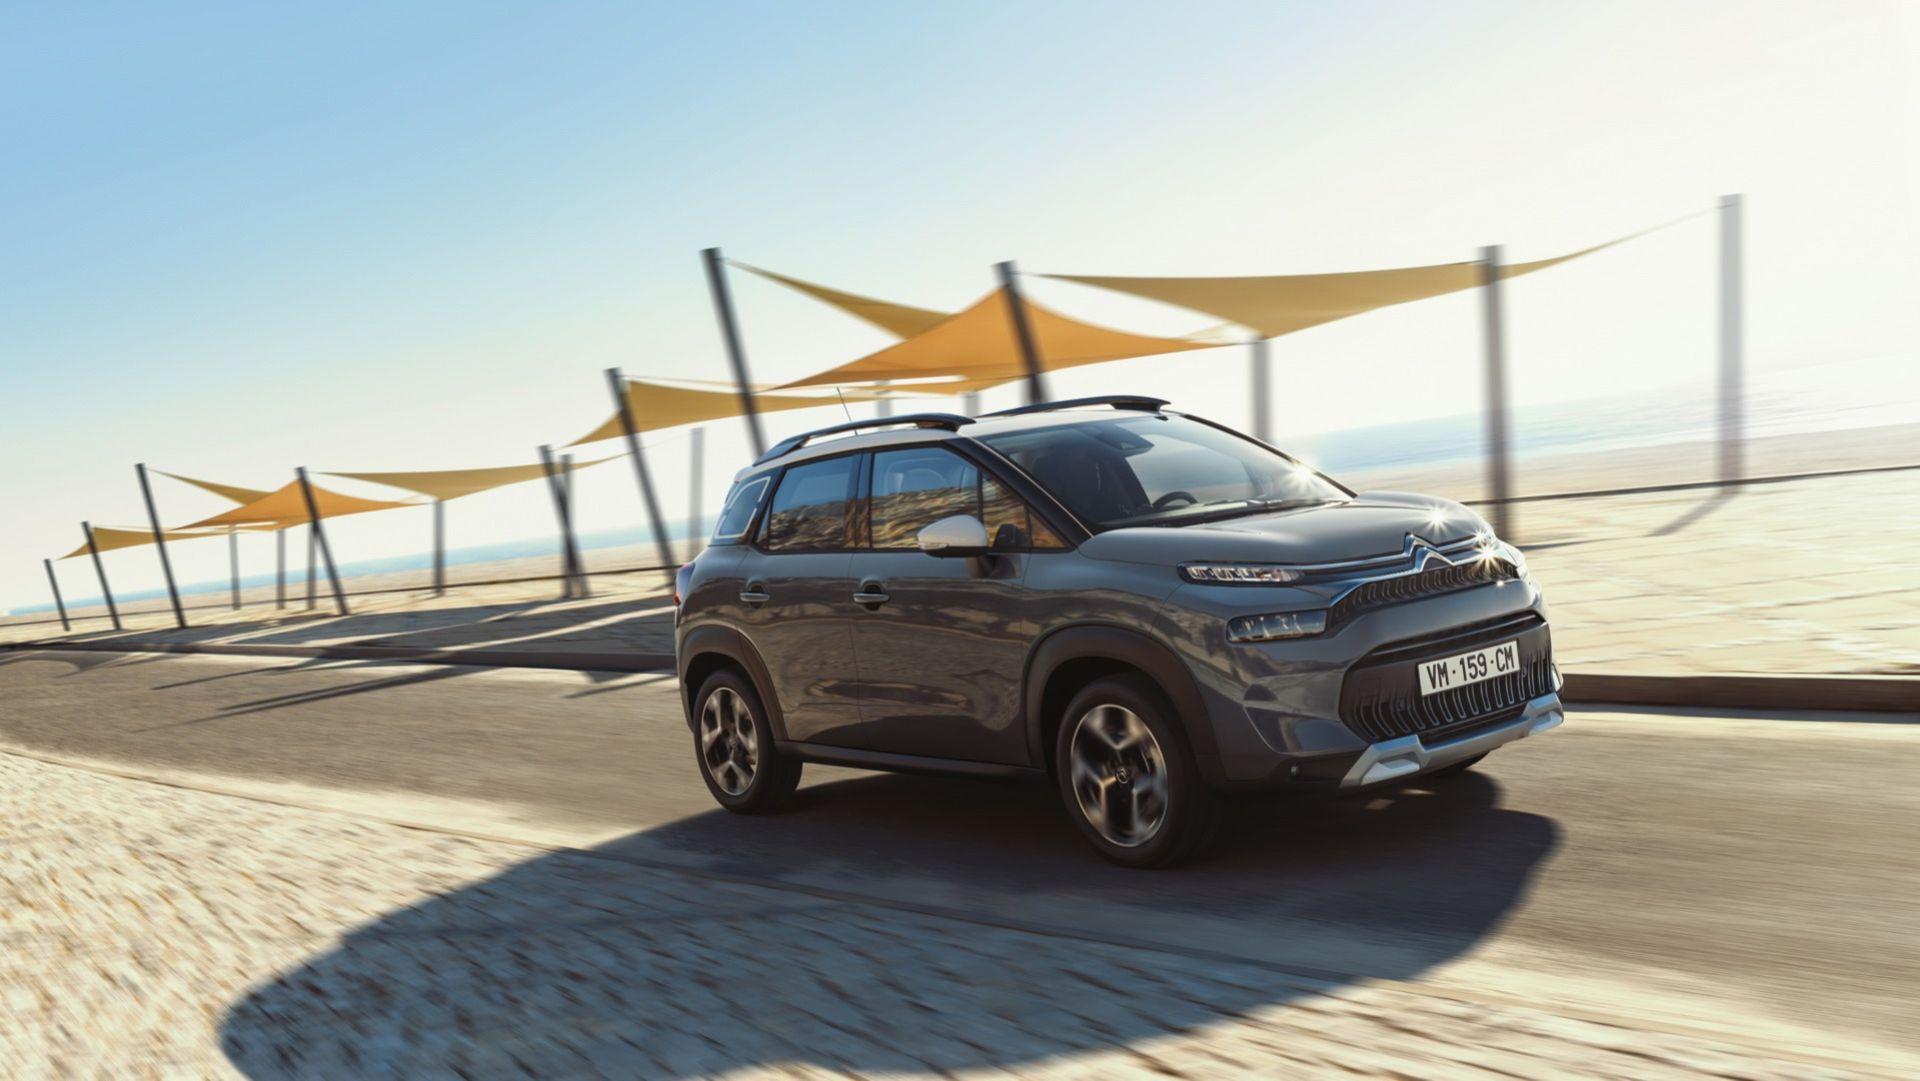 Citroën lyfter C3 Aircross